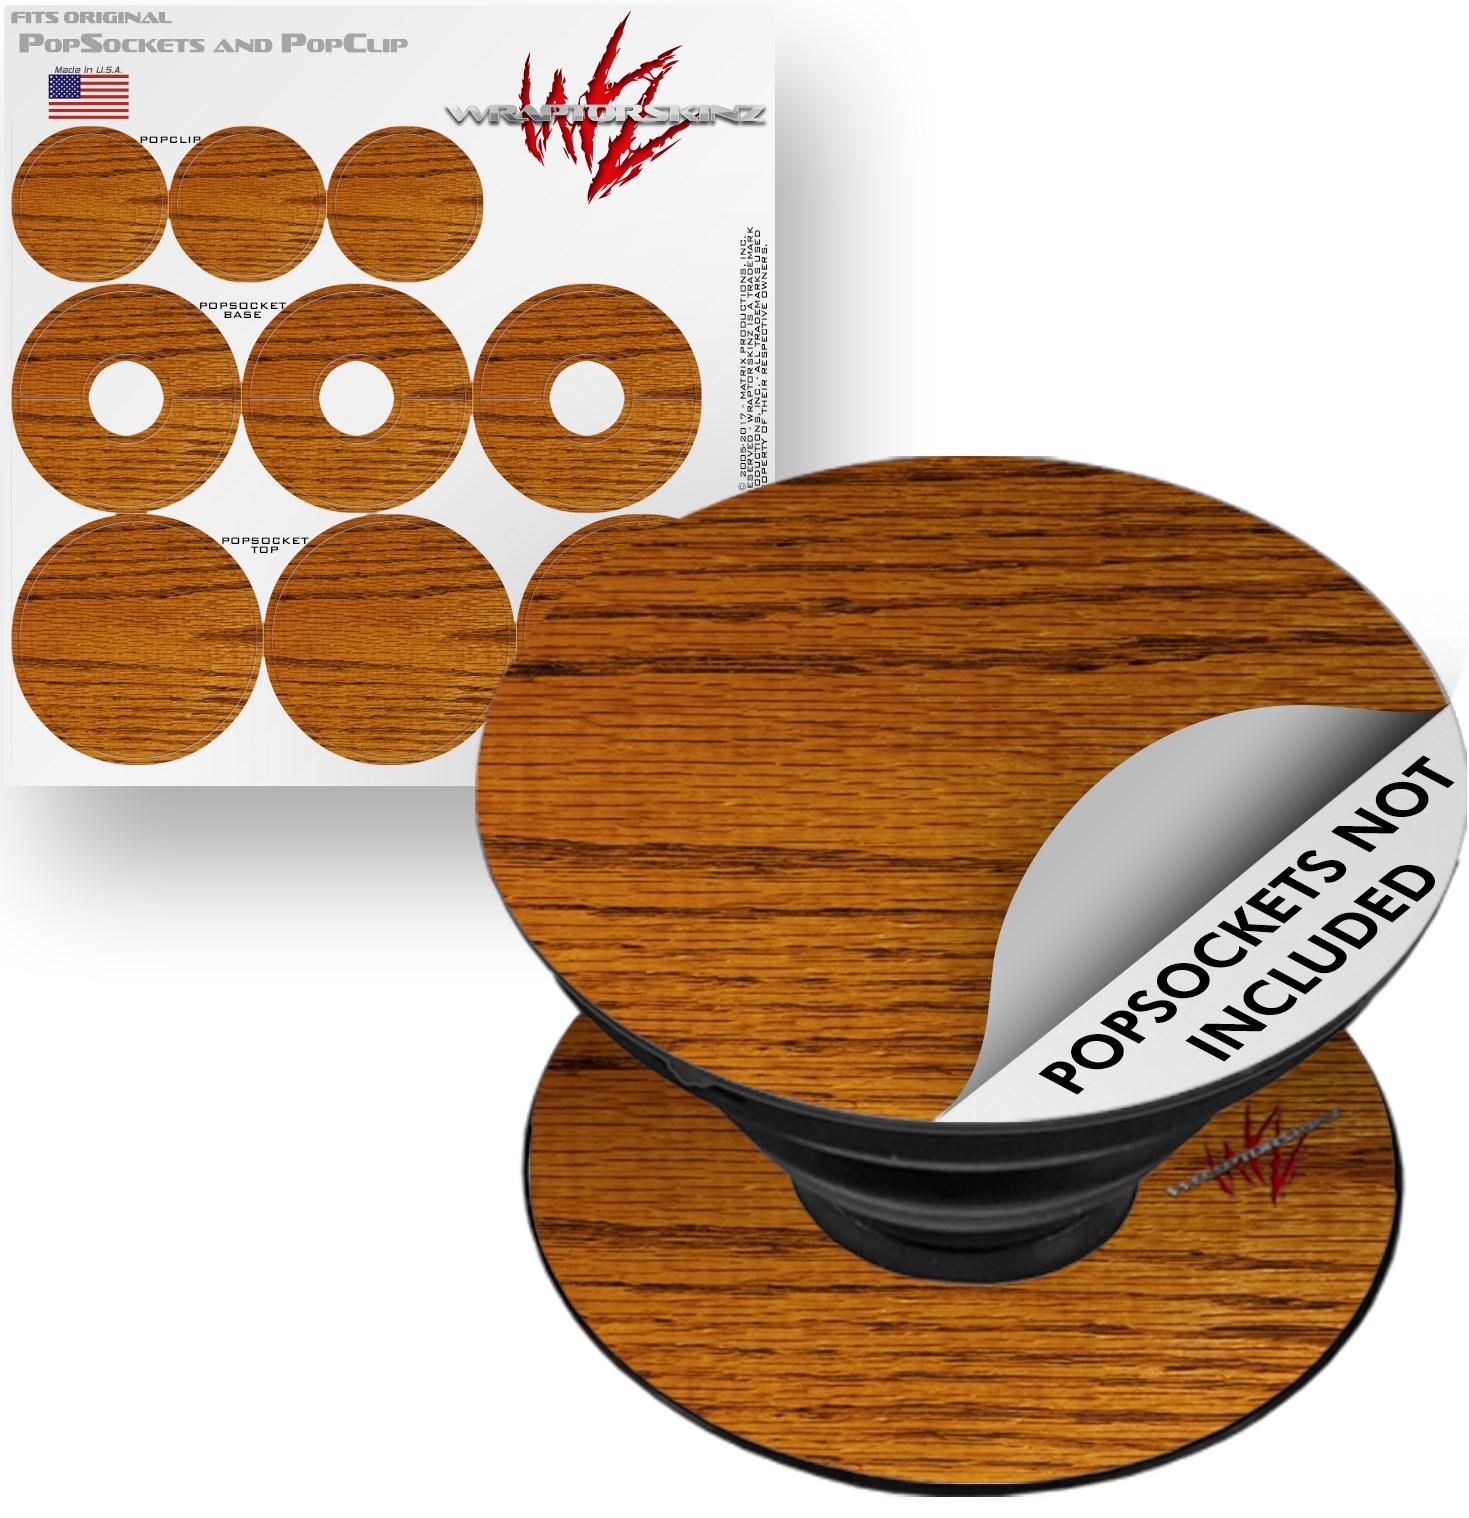 Decal Style Vinyl Skin Wrap 3 Pack for PopSockets Wood Grain - Oak 01 (POPSOCKET NOT INCLUDED) by WraptorSkinz